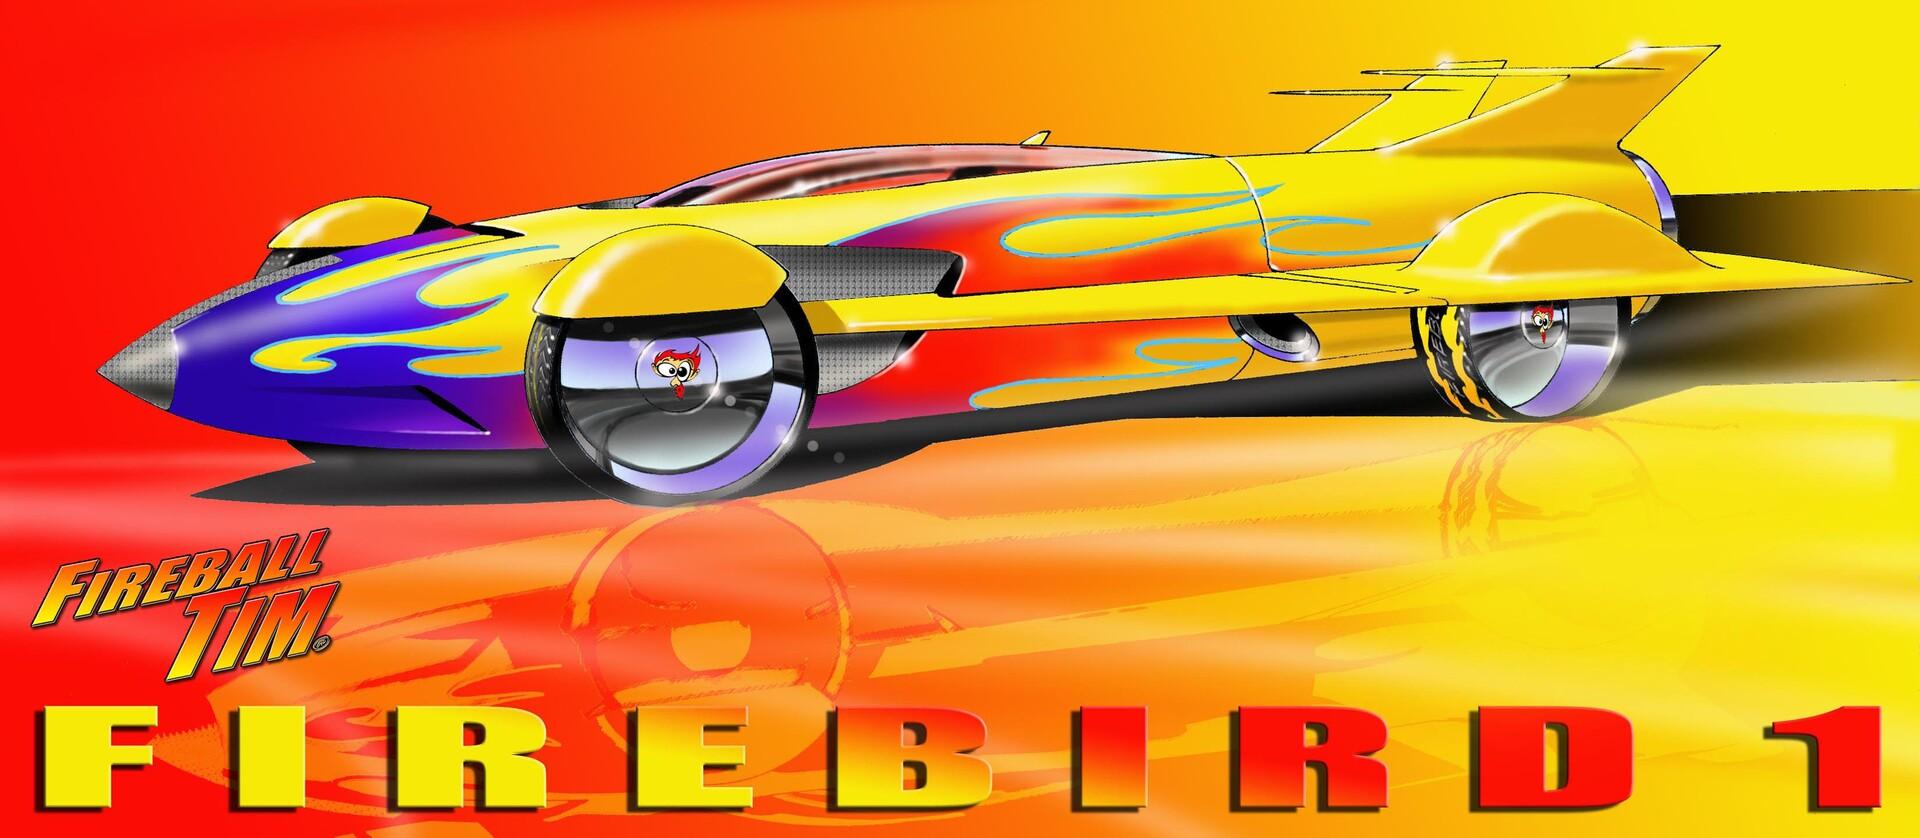 FIREBIRD 1 CONCEPT - Client - General Motors